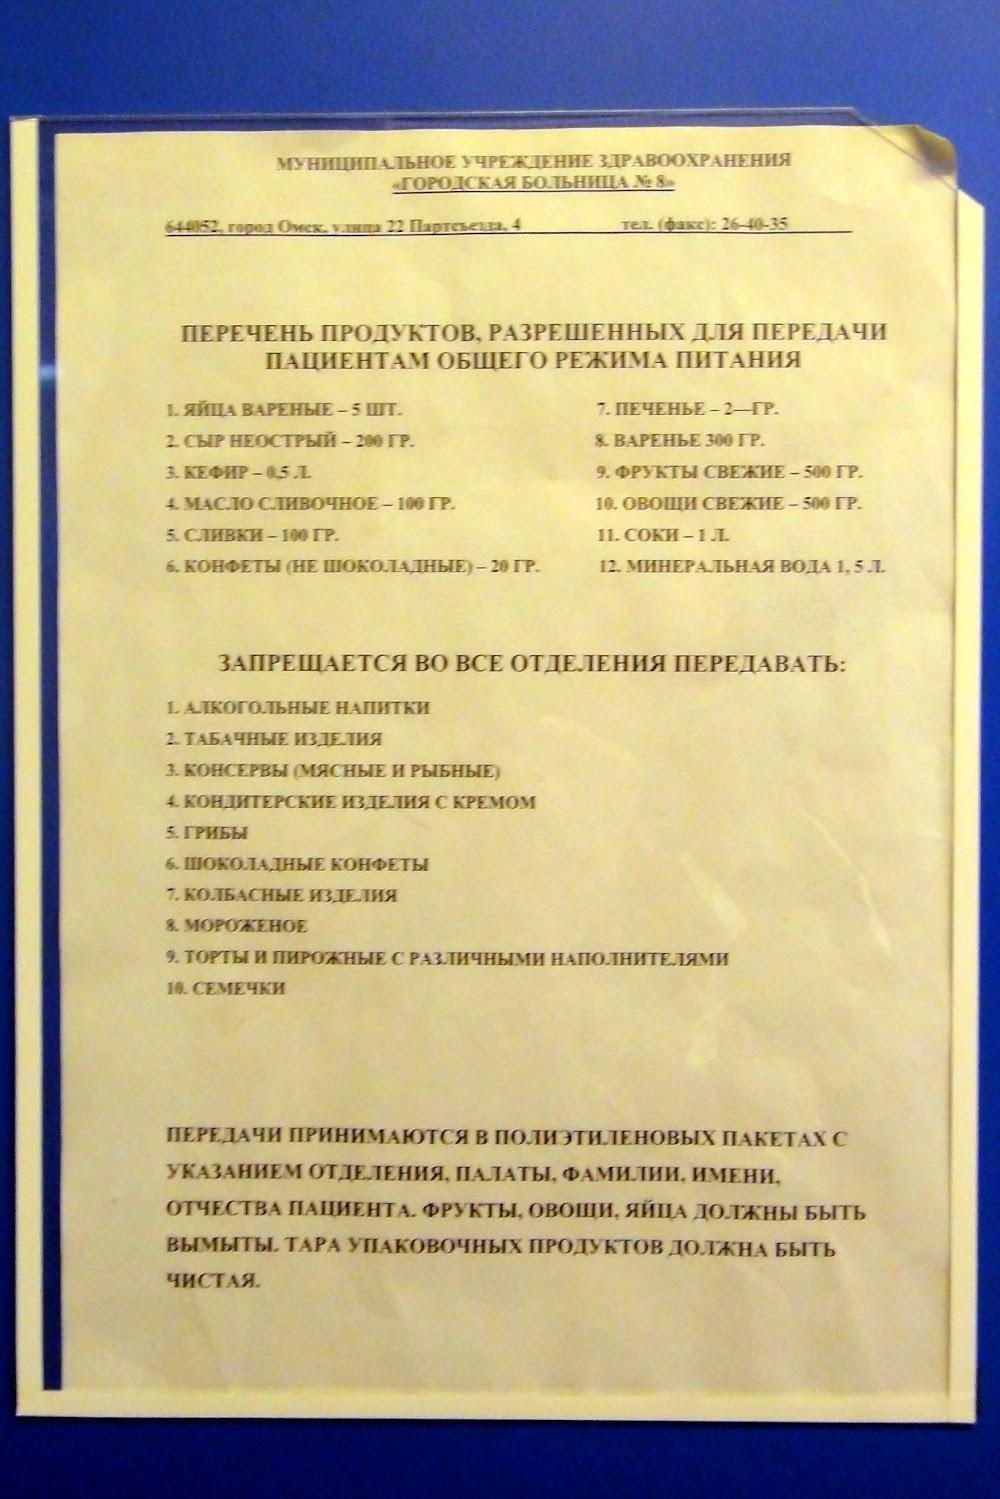 Сайт 9 поликлиники волгограда